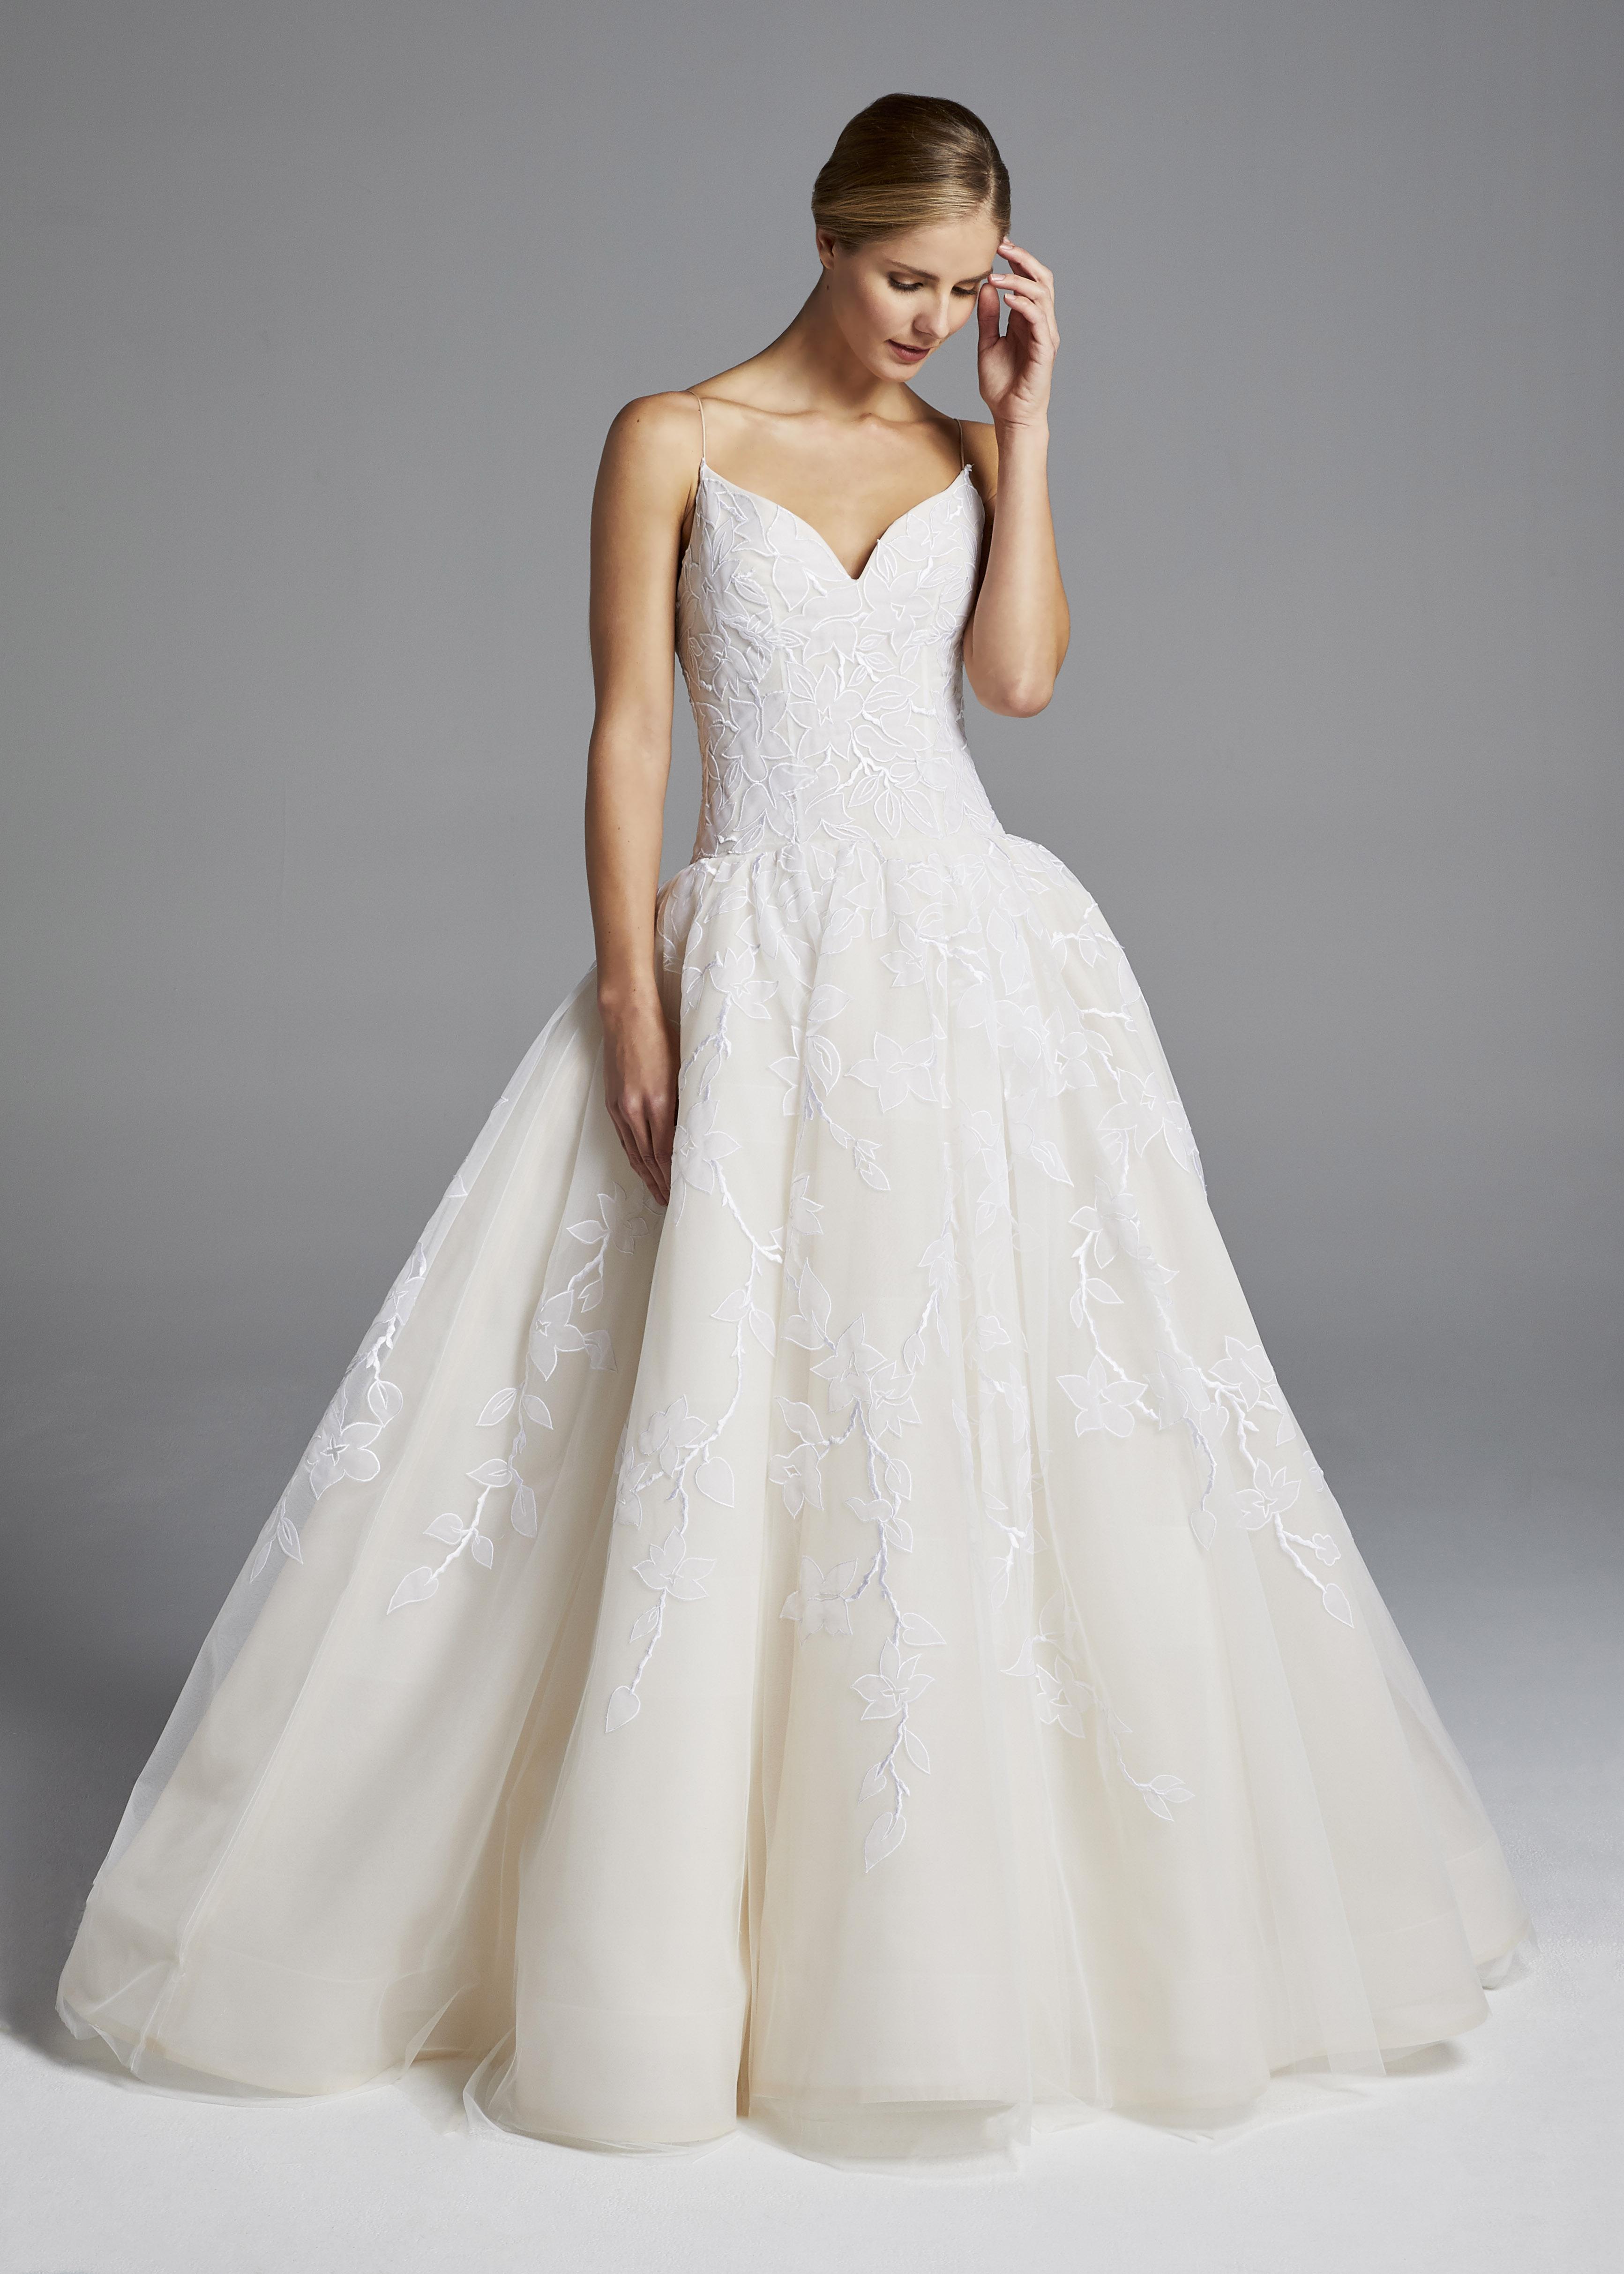 anne barge spaghetti strap ball gown wedding dress spring 2019